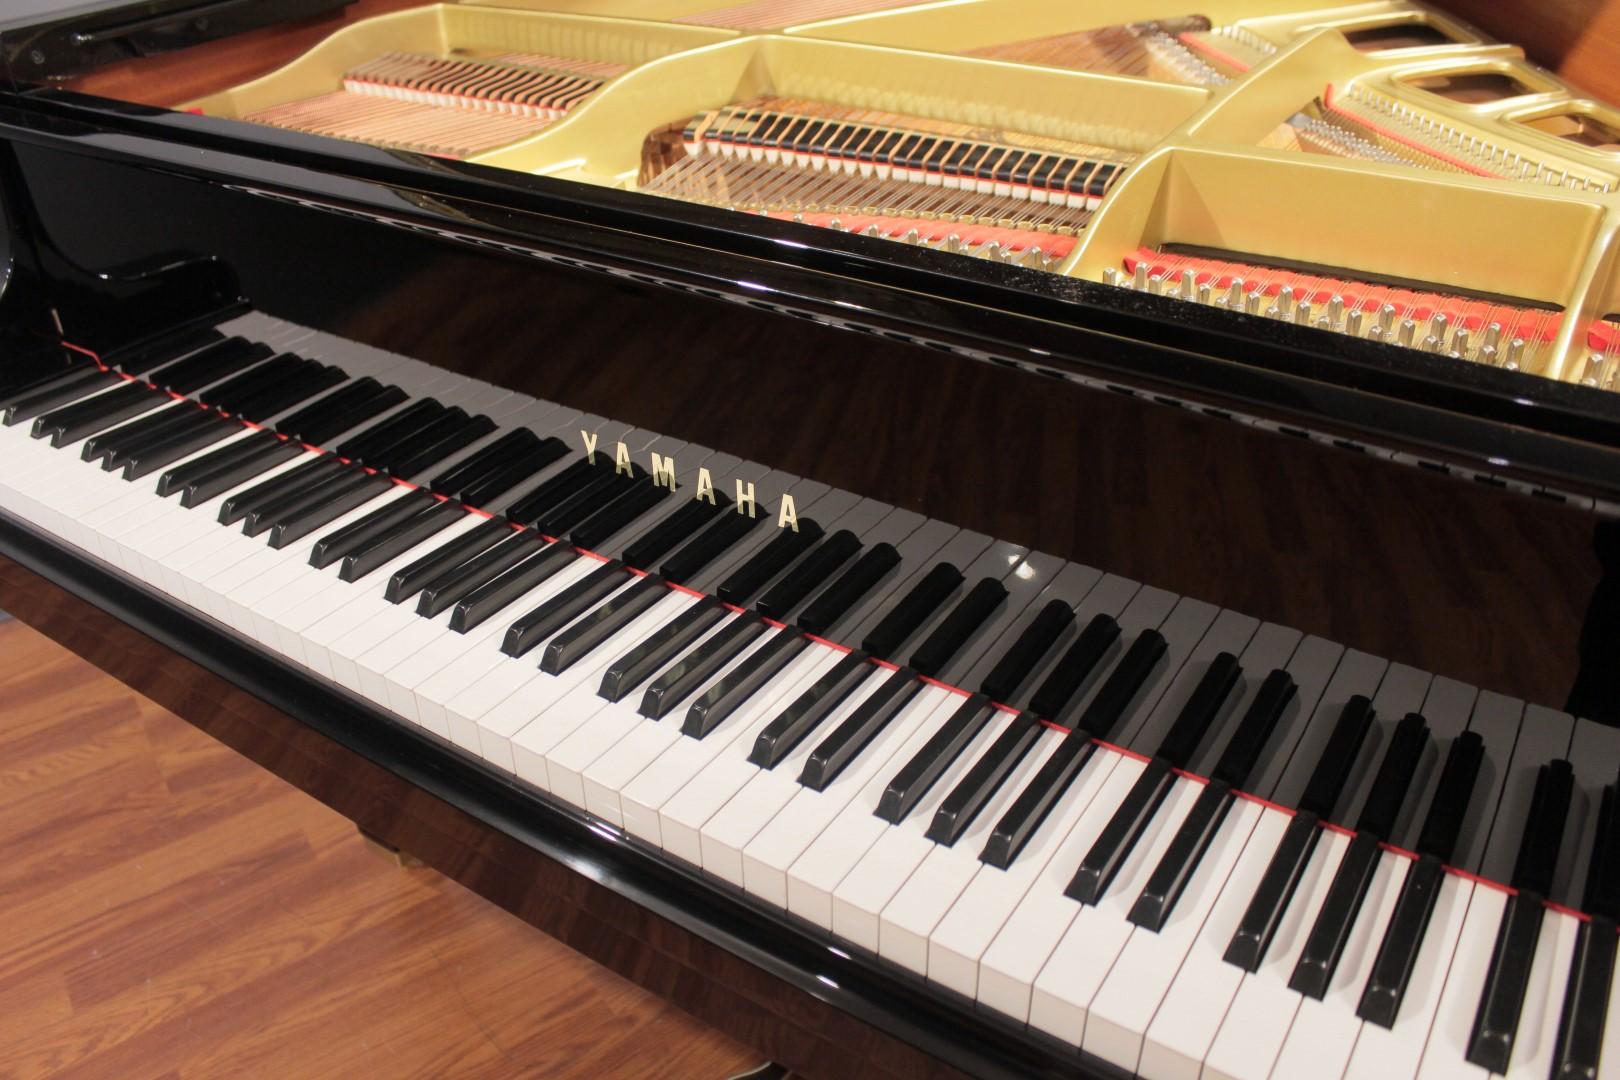 Yamaha gh1b 5 39 3 39 39 baby grand piano 1993 grand pianos for Yamaha piano baby grand